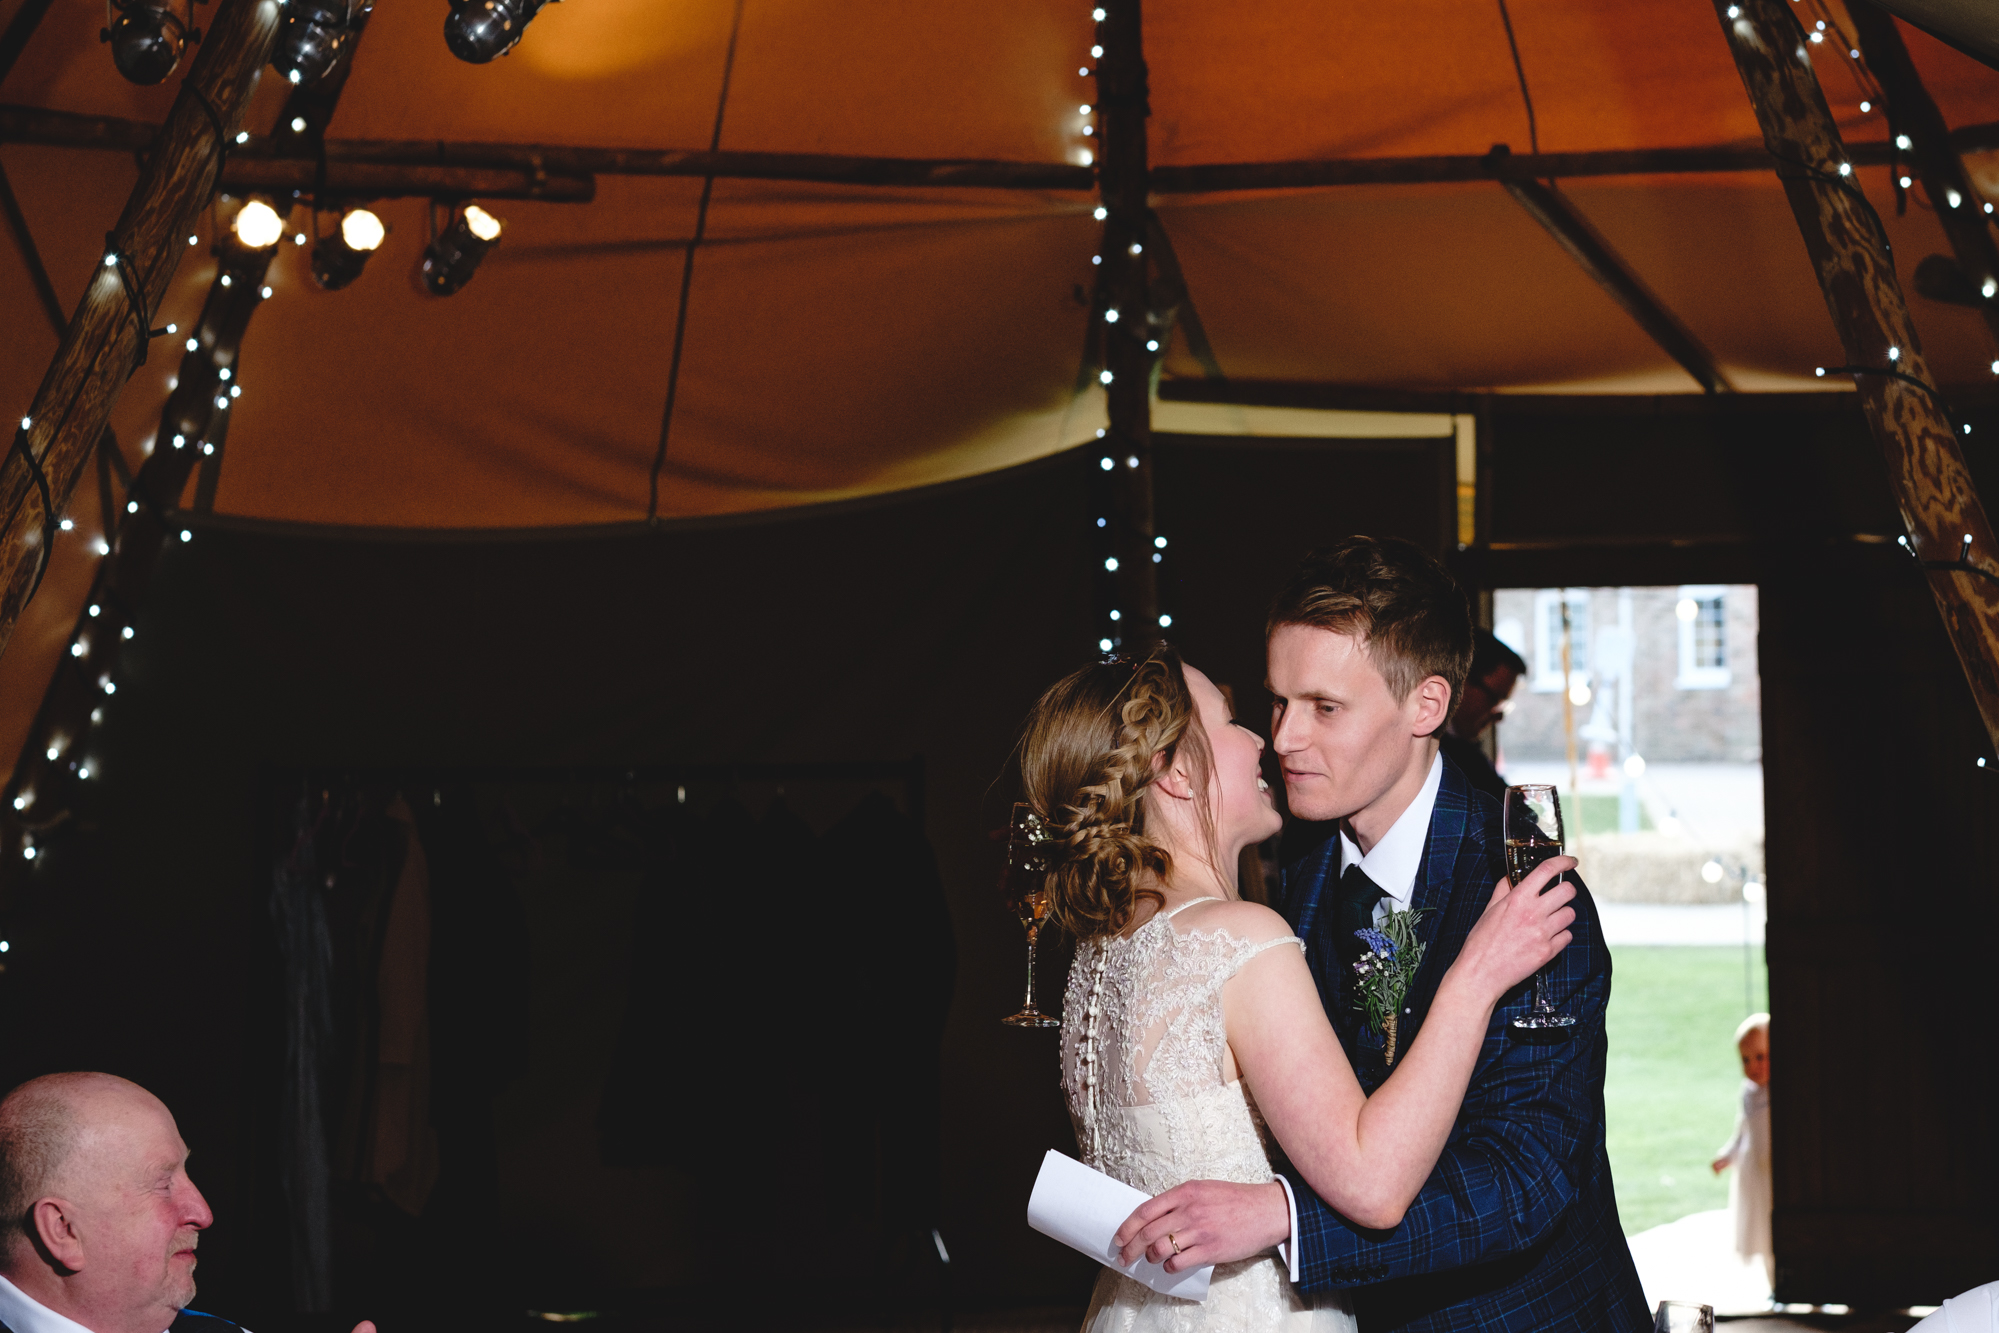 Katie and Dode weddings (170 of 207).jpg